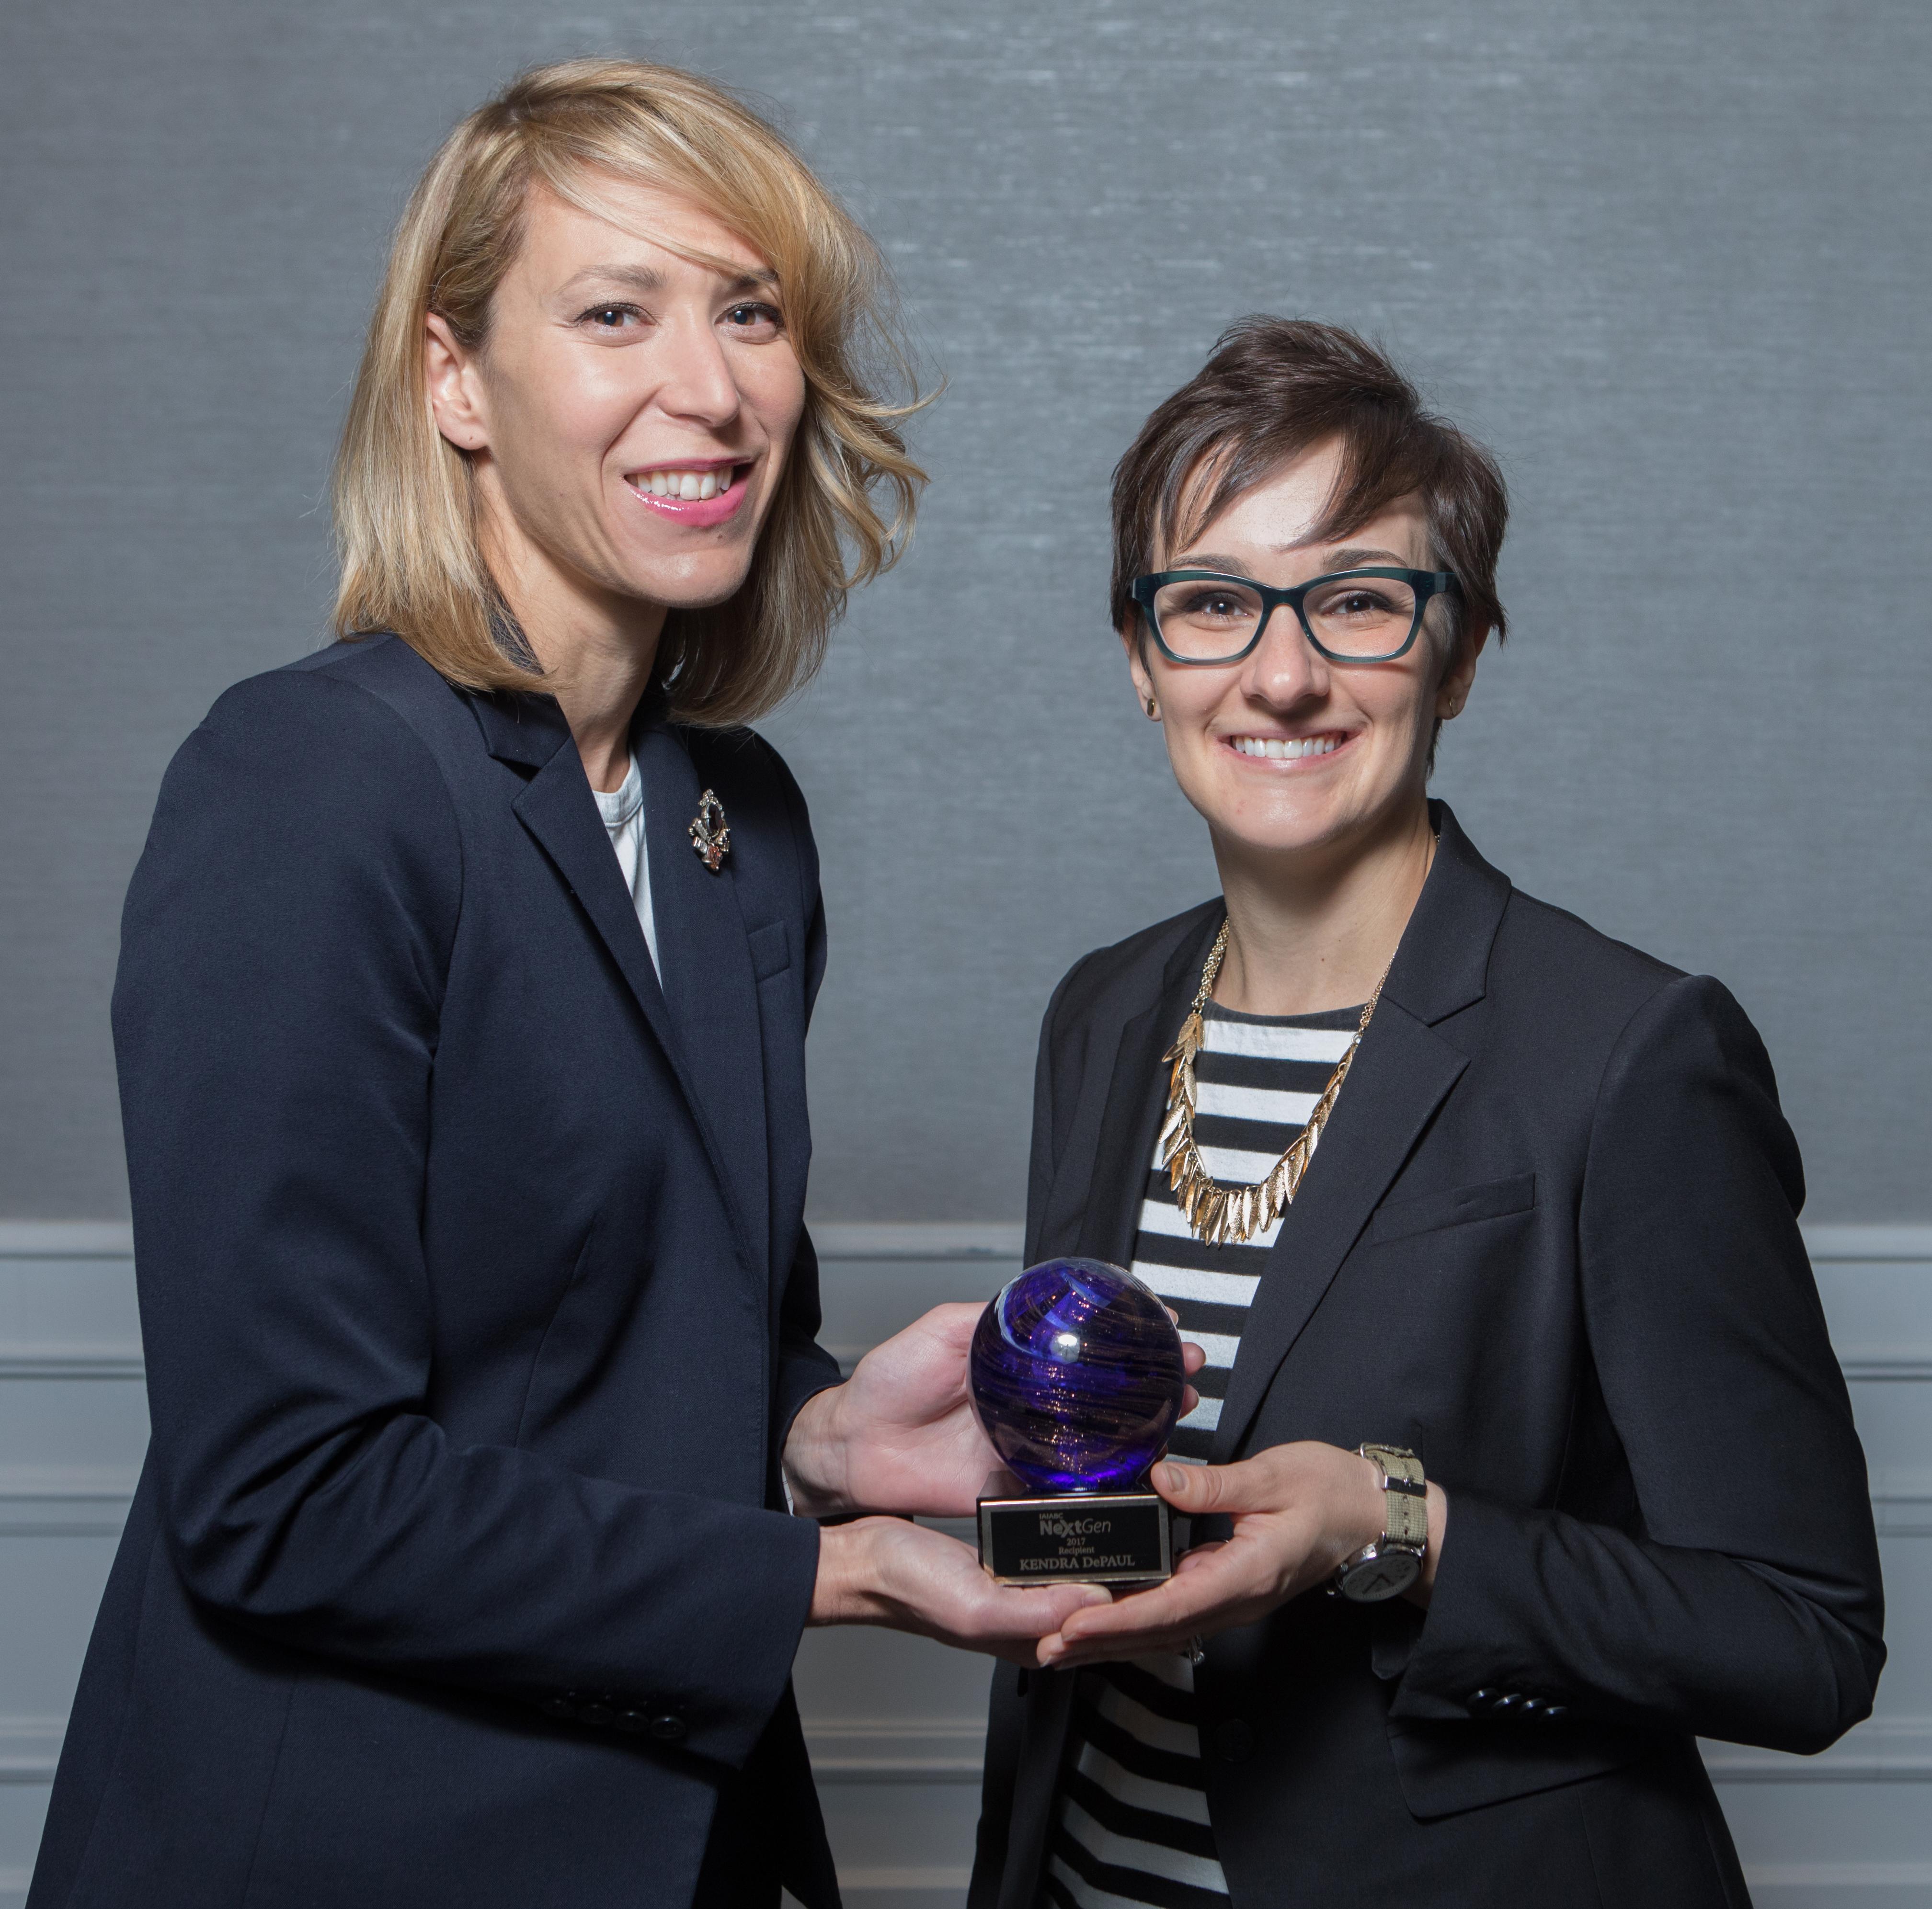 Kendra DePaul, 2017 NextGen Award Winner